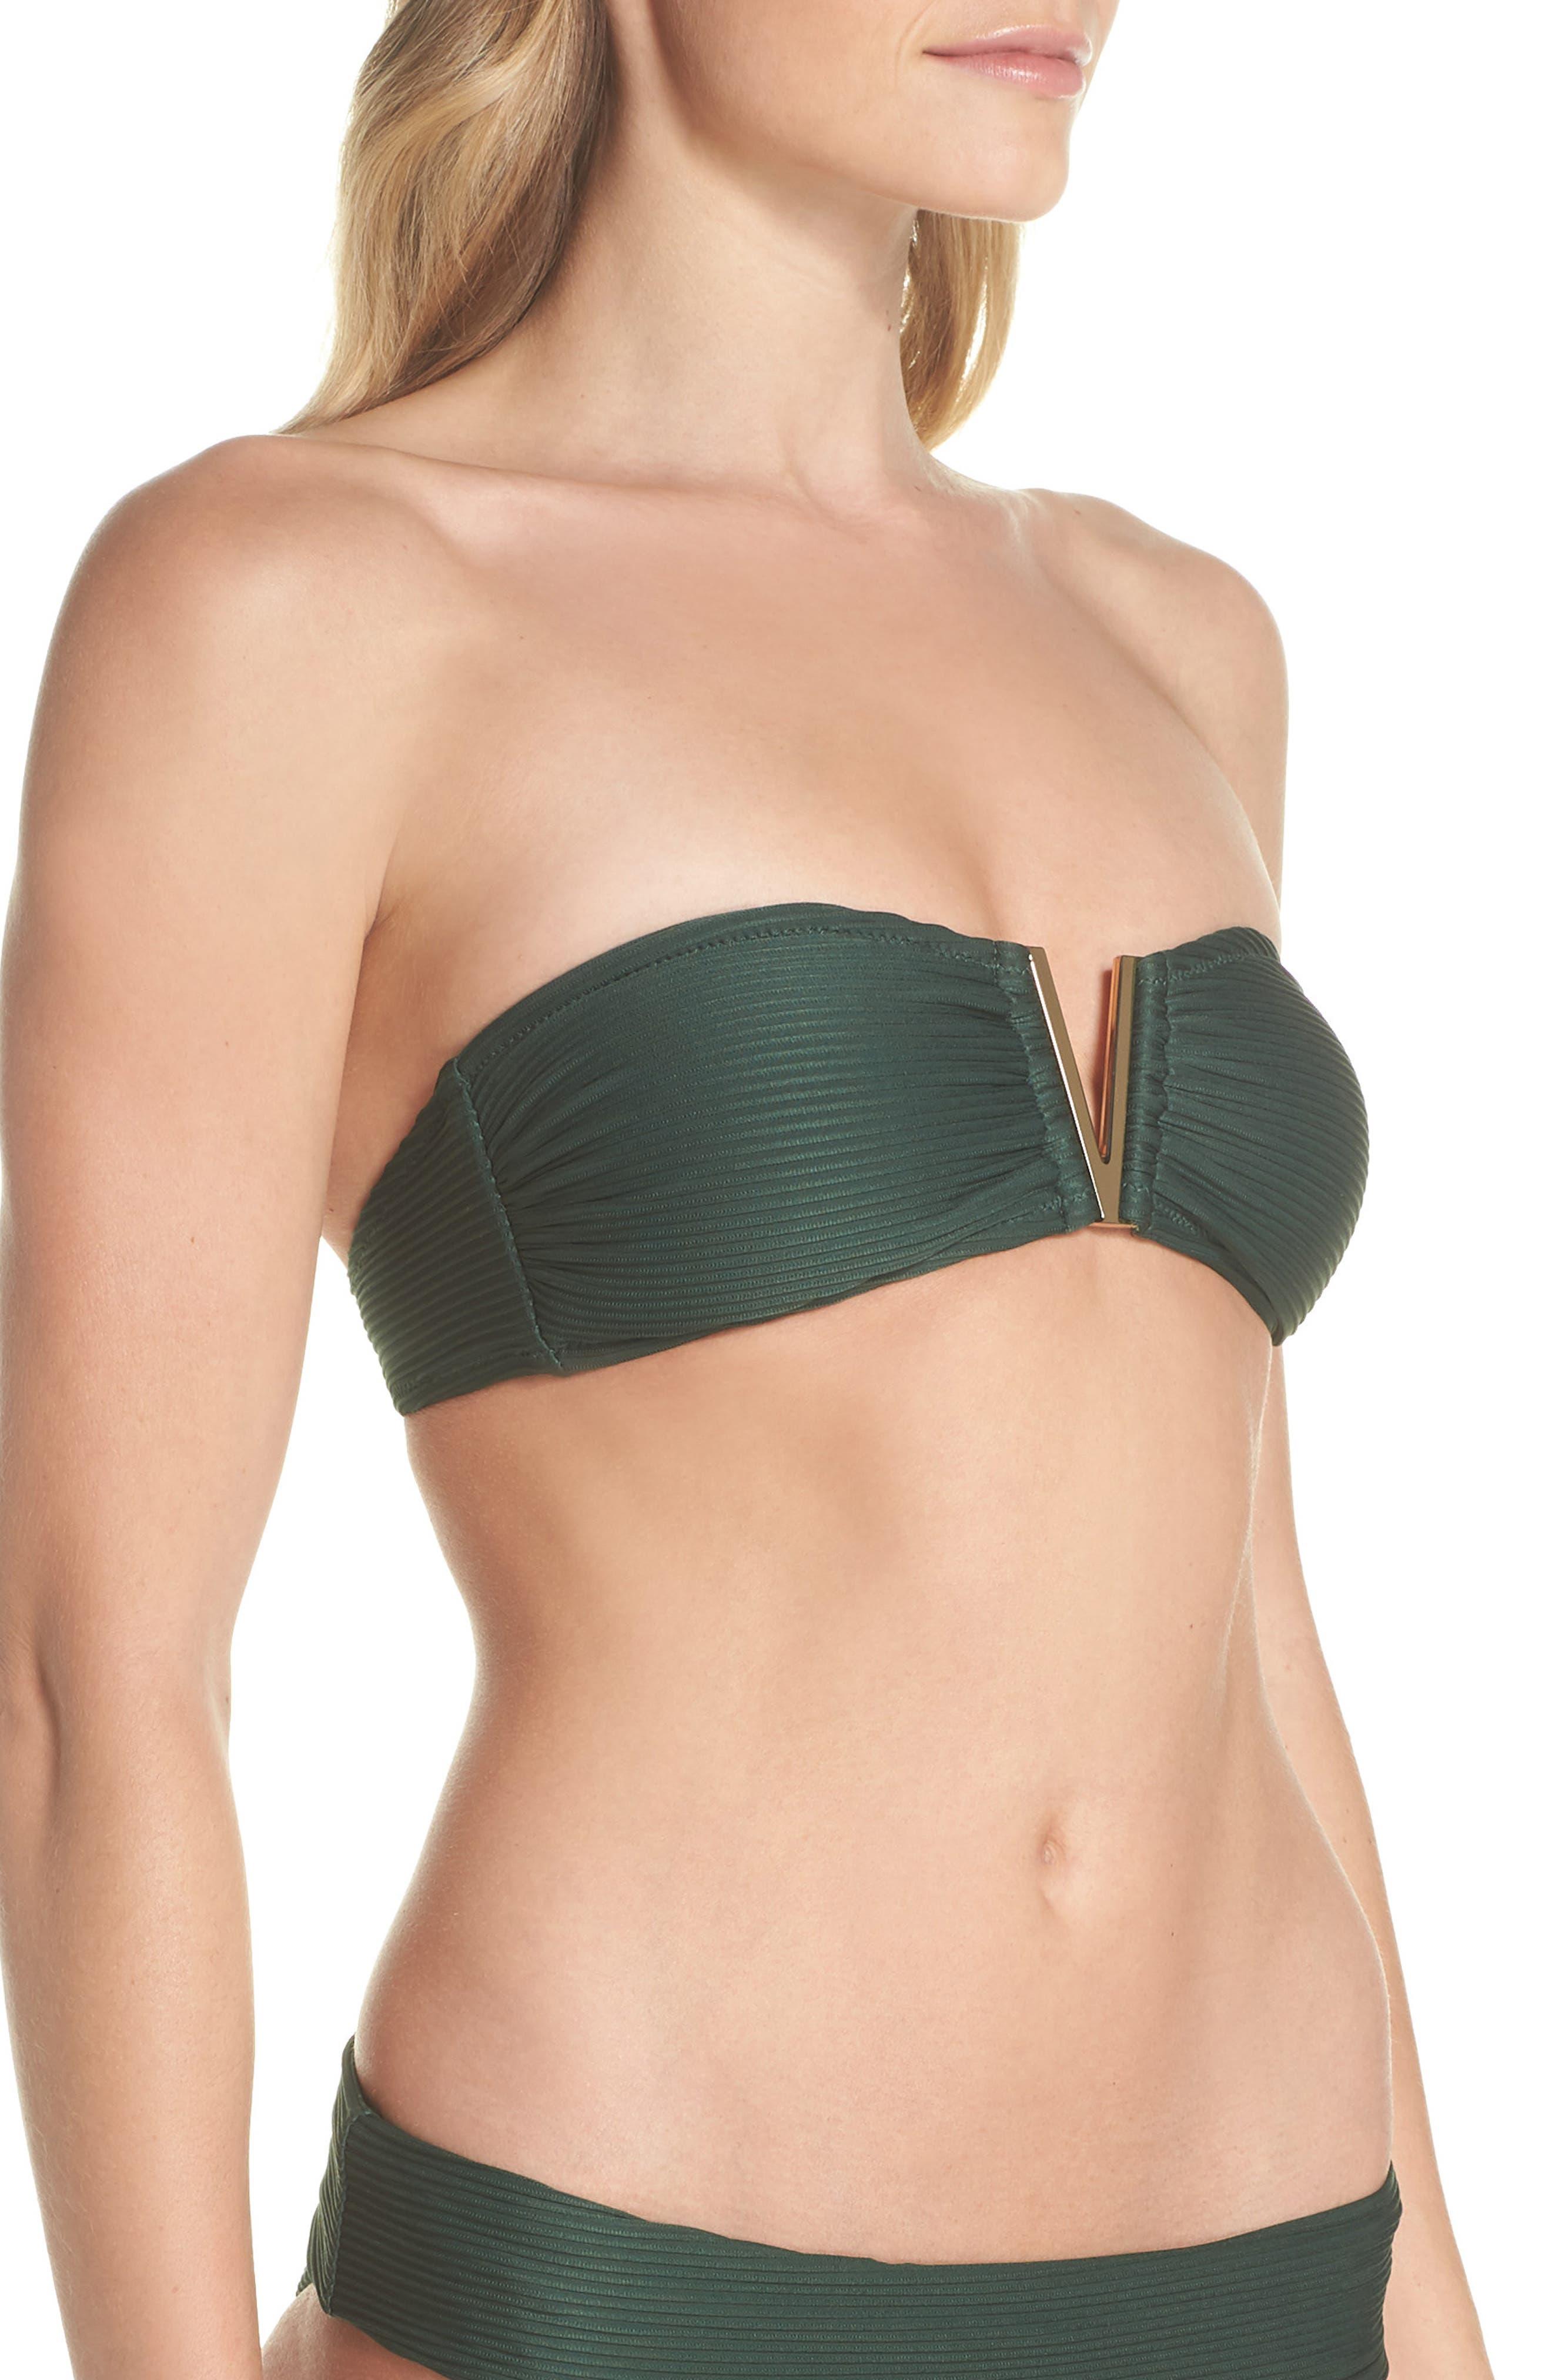 Bandeau Bikini Top,                             Alternate thumbnail 4, color,                             GREEN